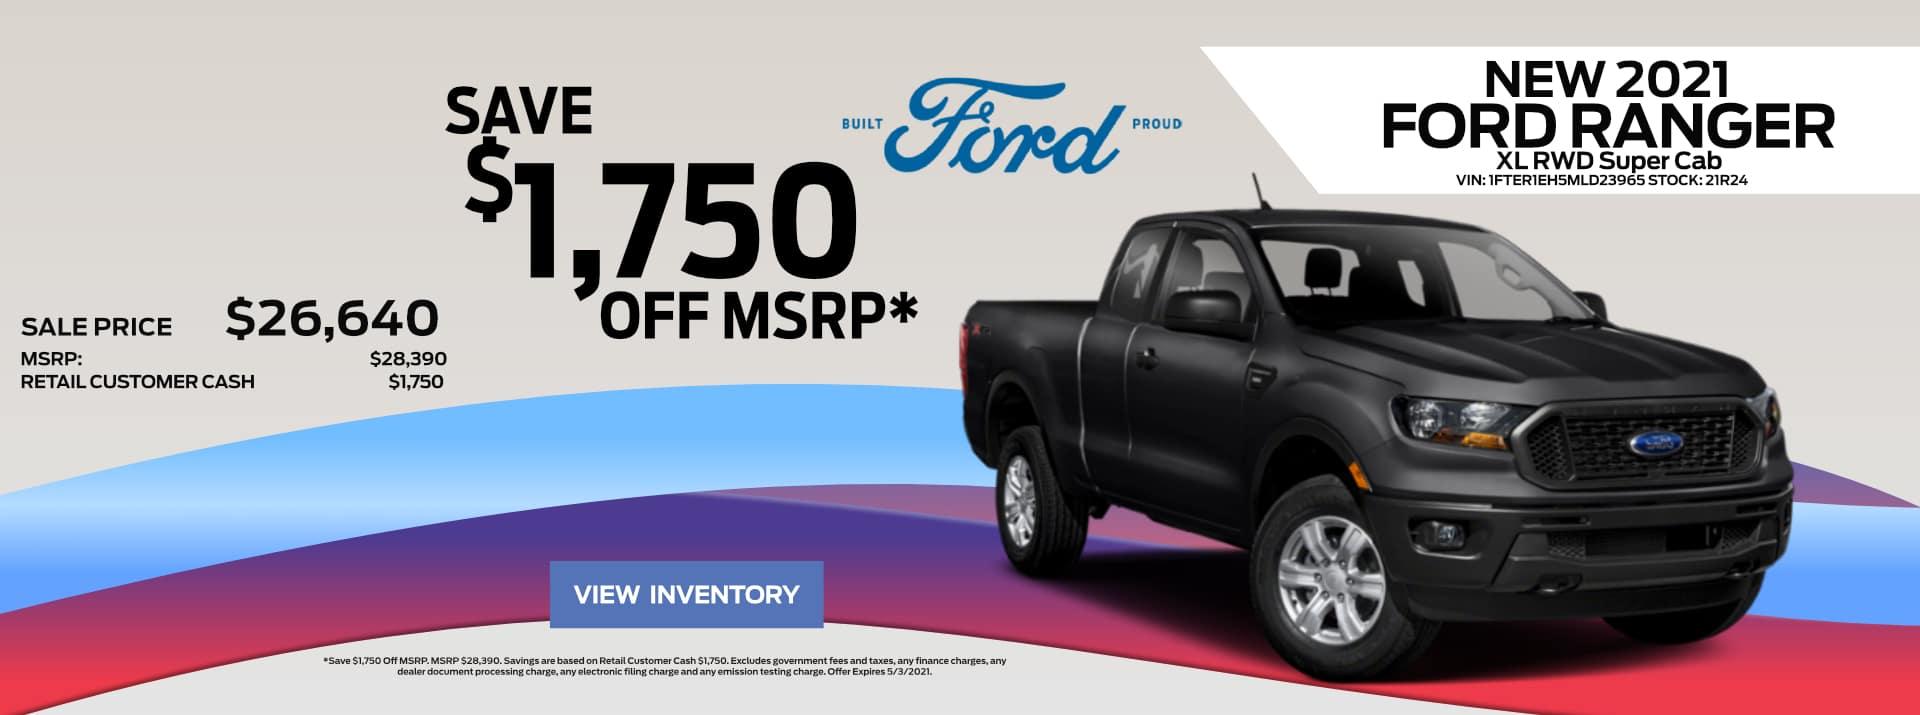 April-2021 Ford Ranger Save PSF